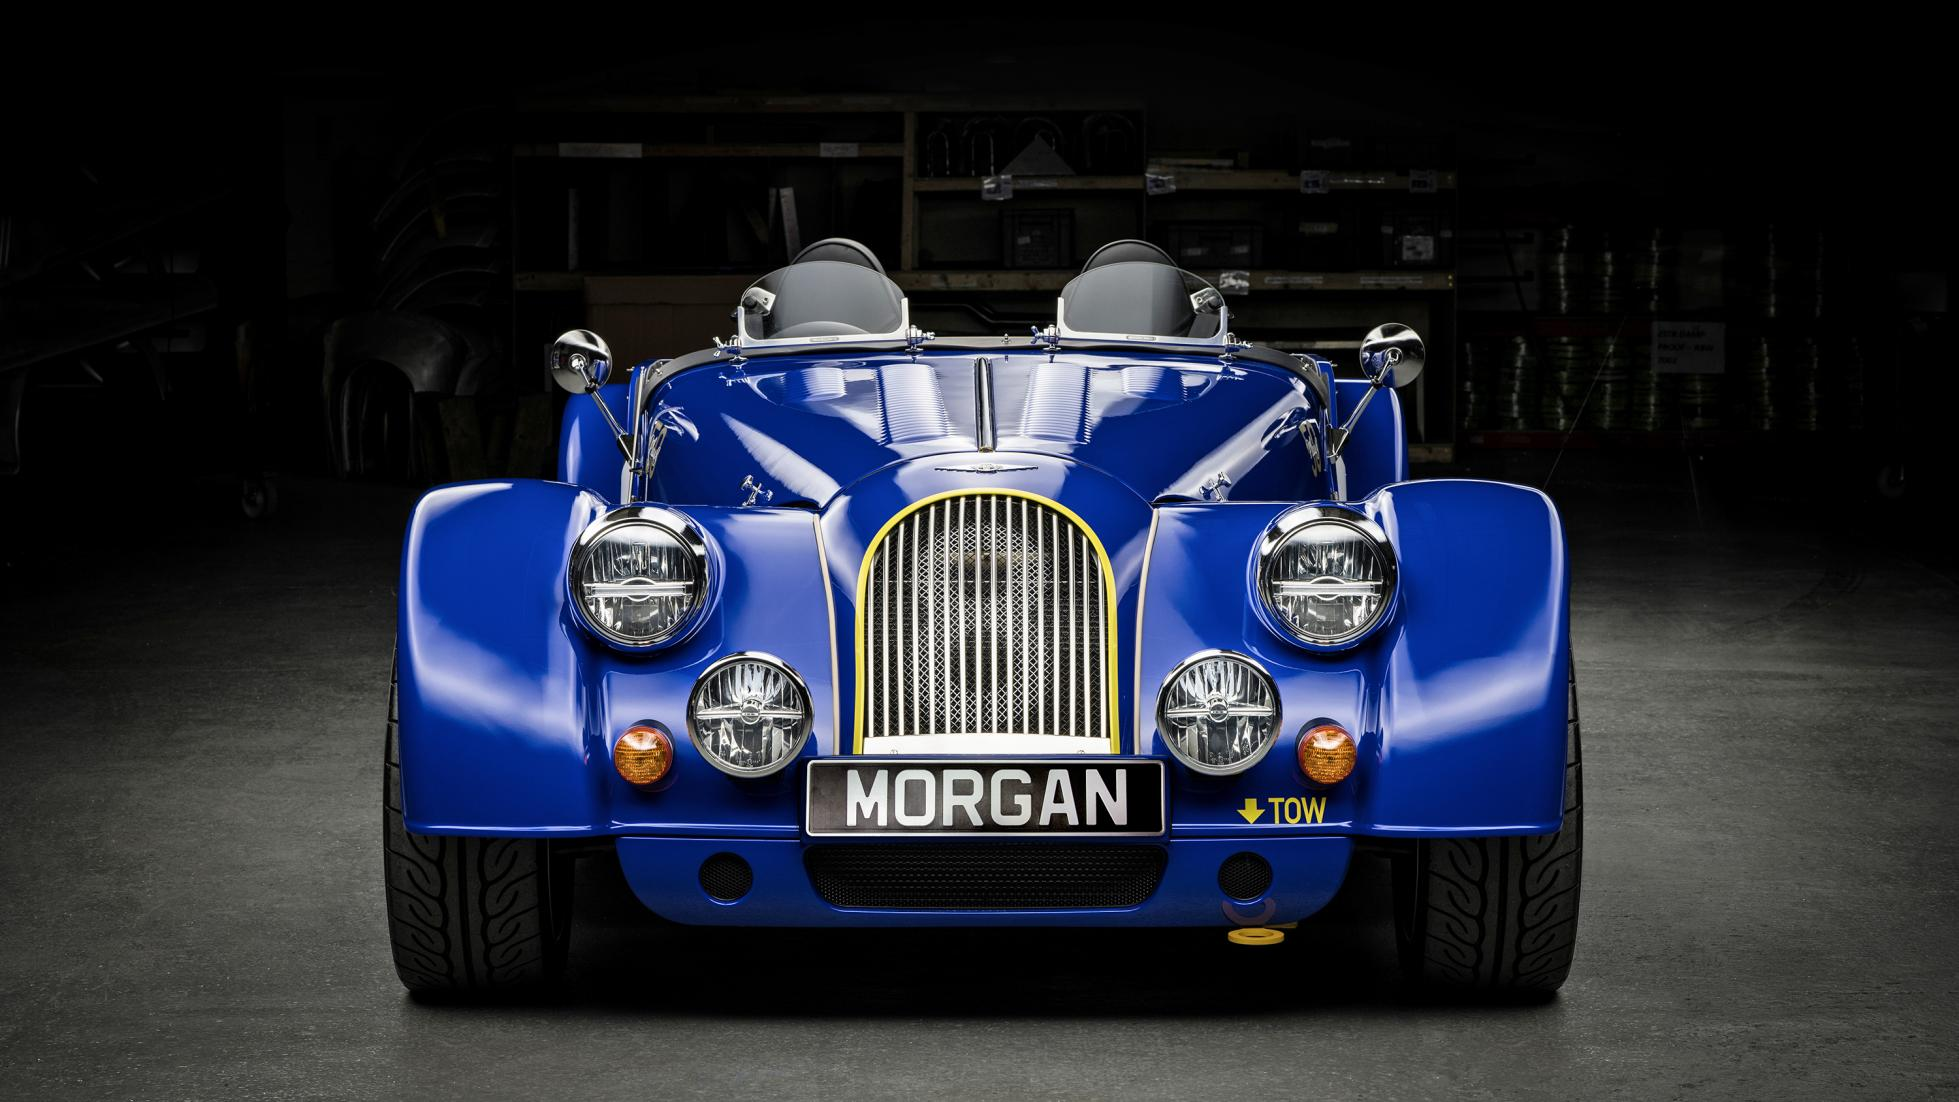 Morgan dit adieu au V8 - Galerie